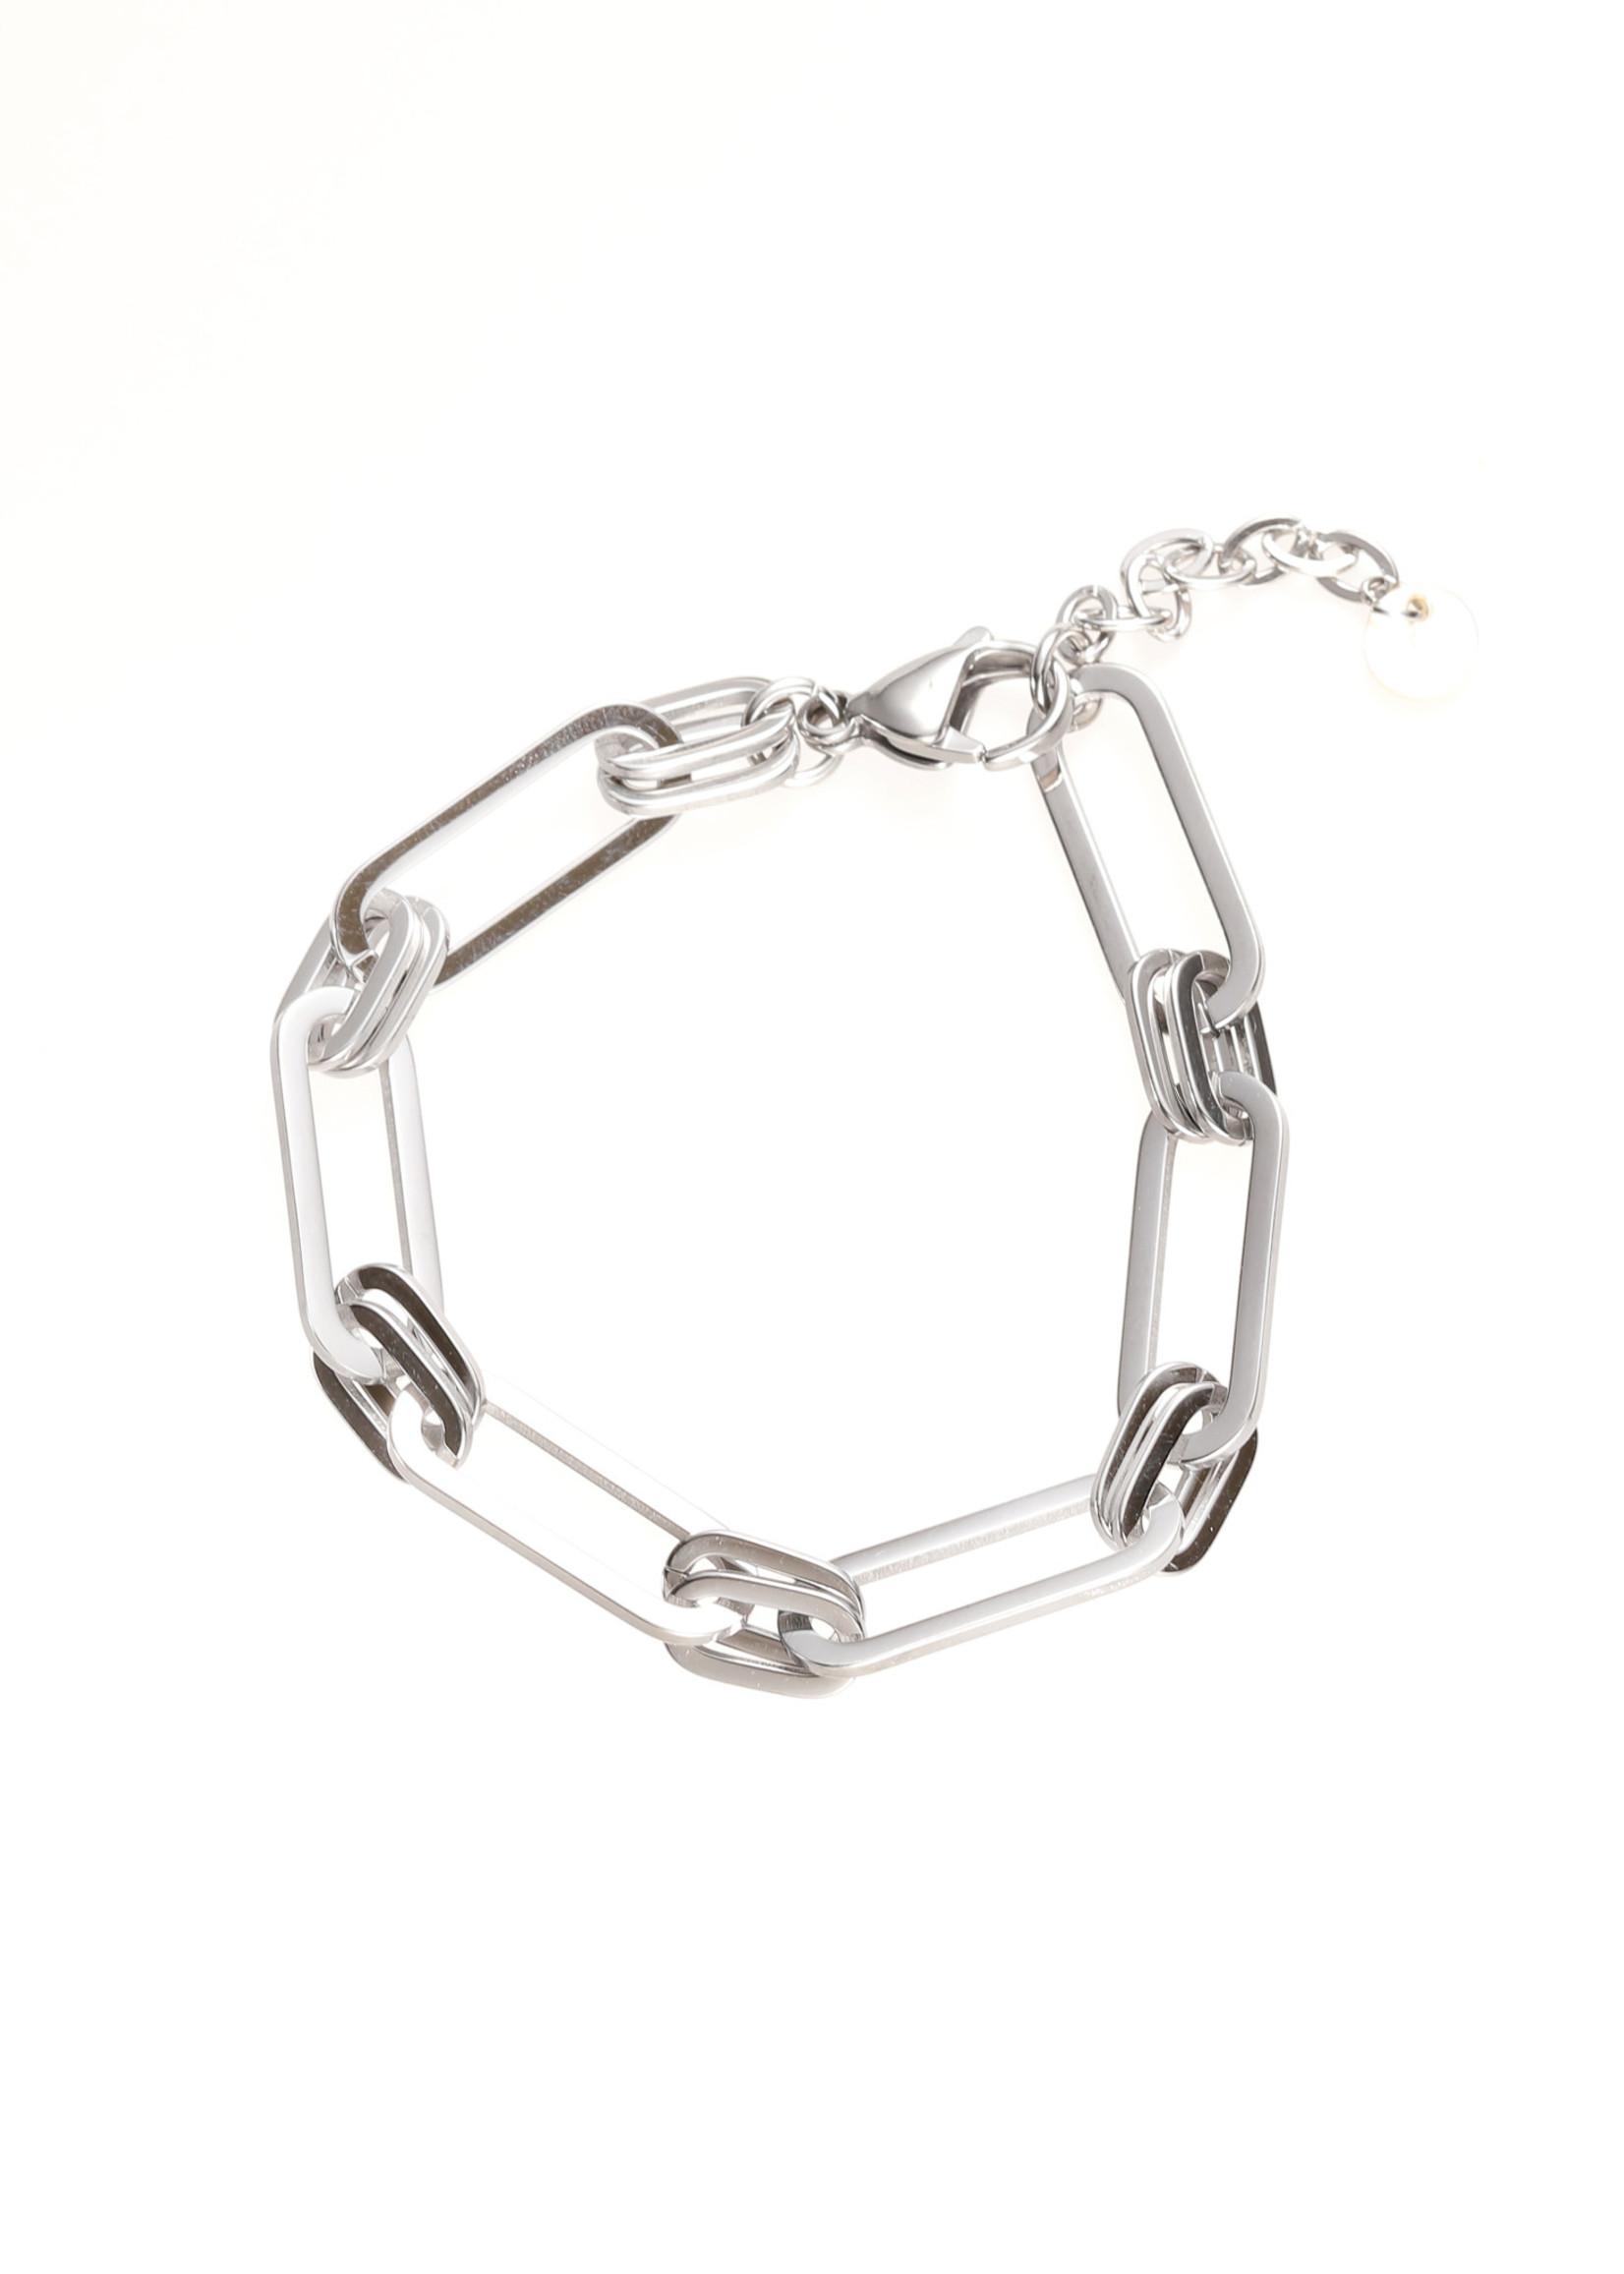 Armband zilver ovale schakel B1731-1